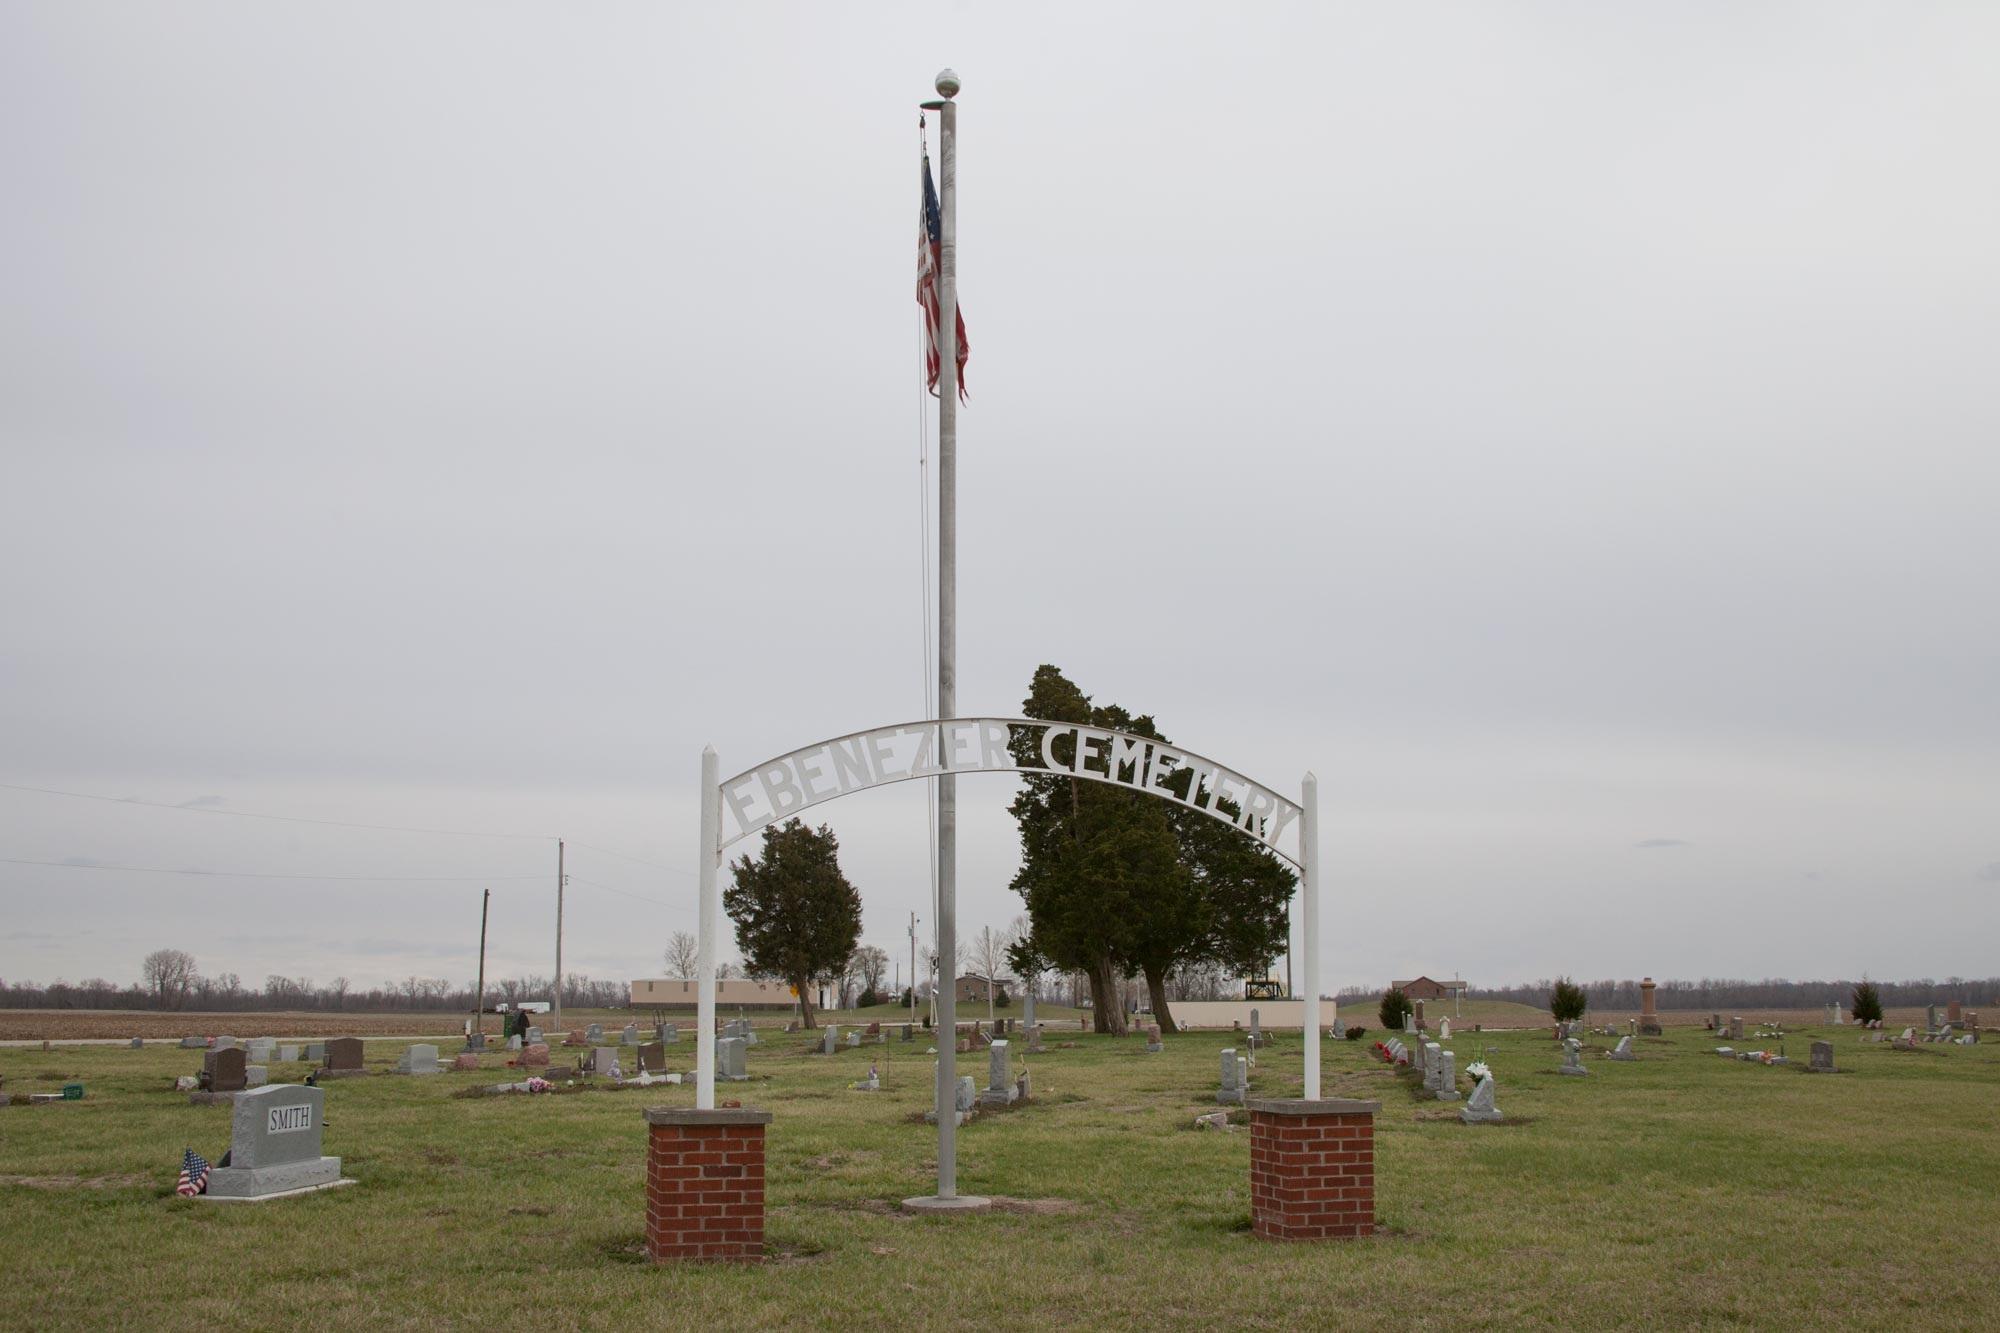 Ebenenzer Cemetery, West Alton, MO